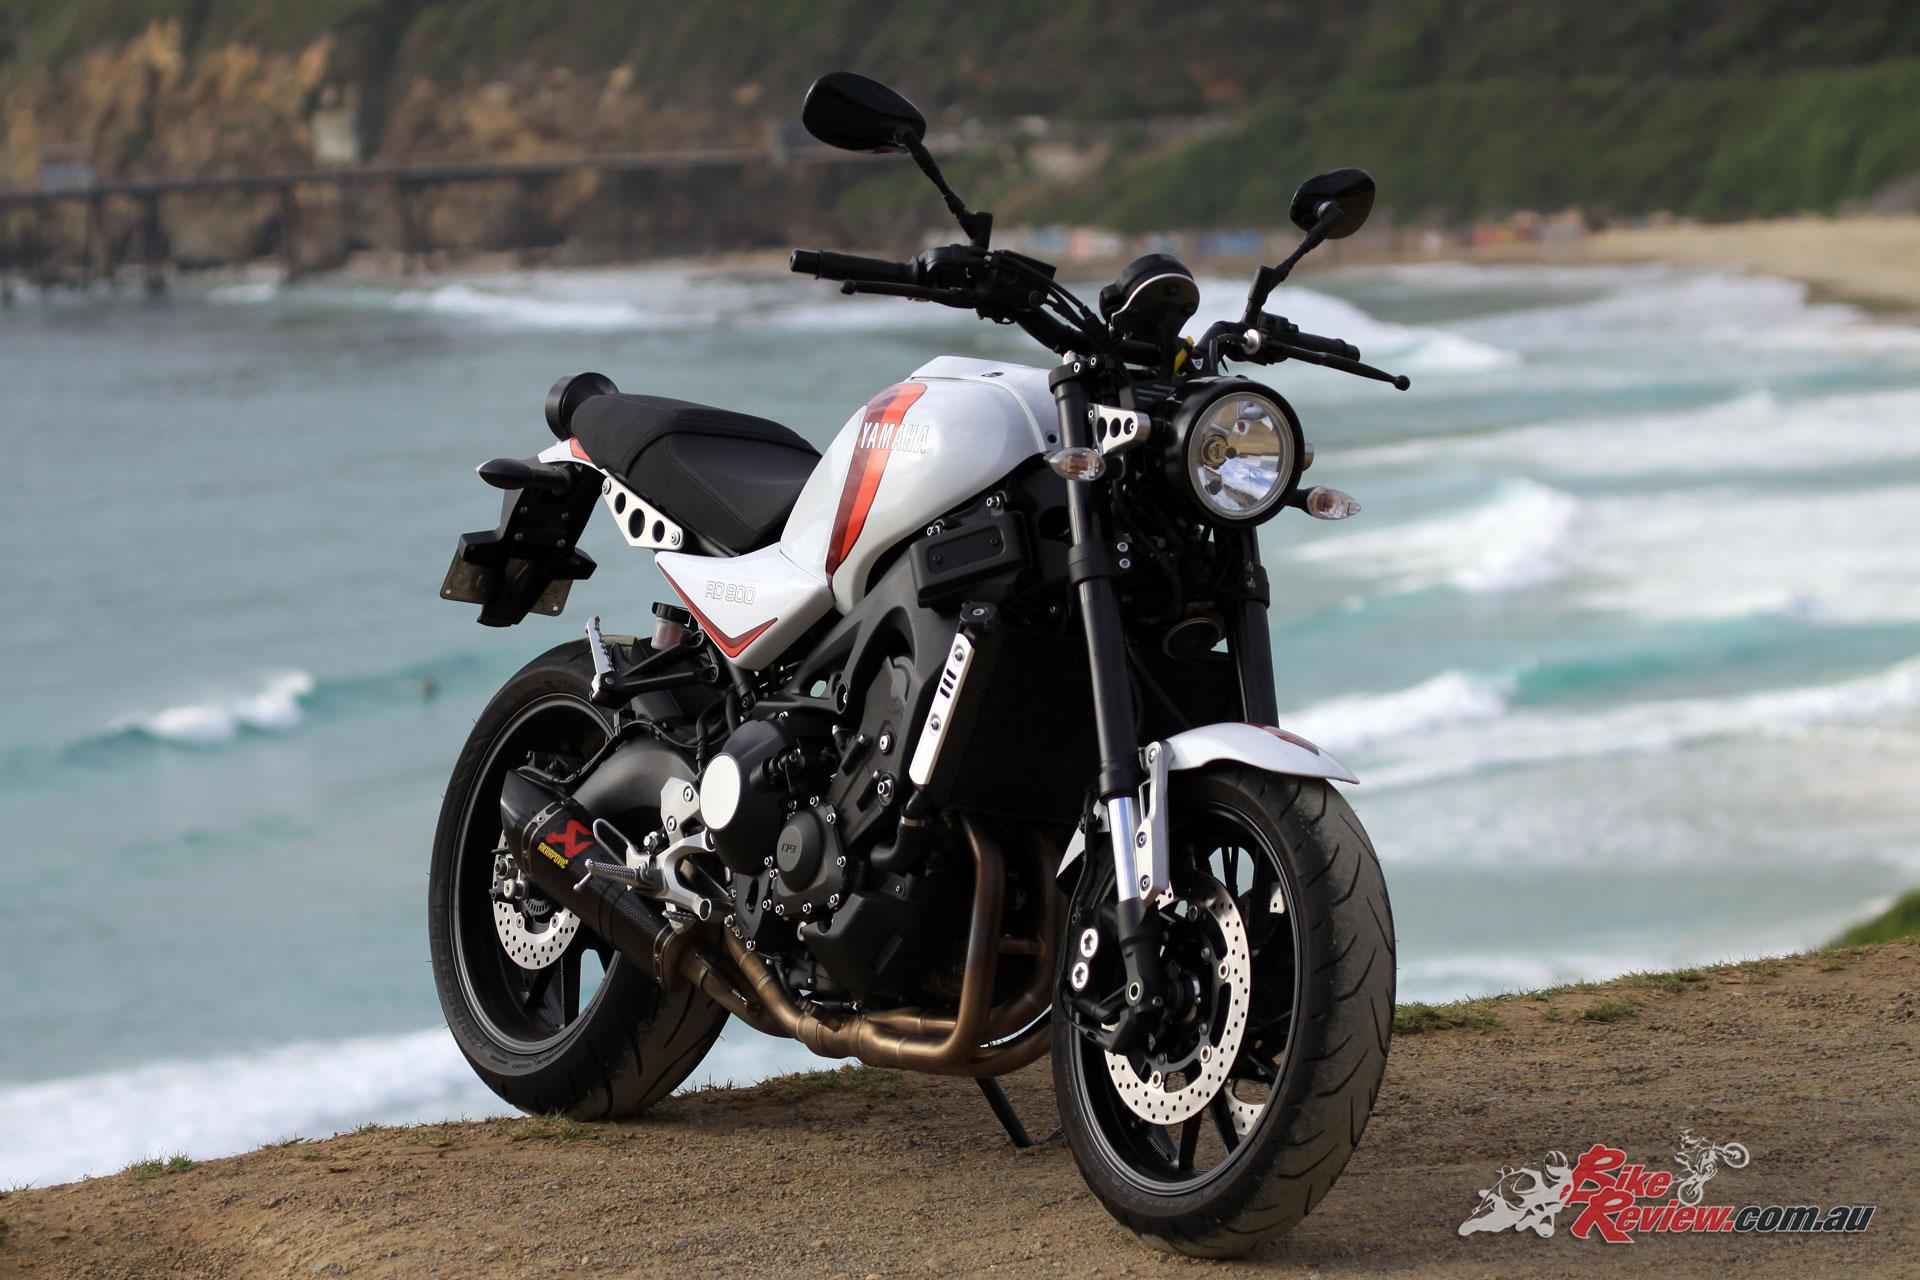 Custom: 2018 Yamaha XSR900 \'RD900LC\' - Bike Review